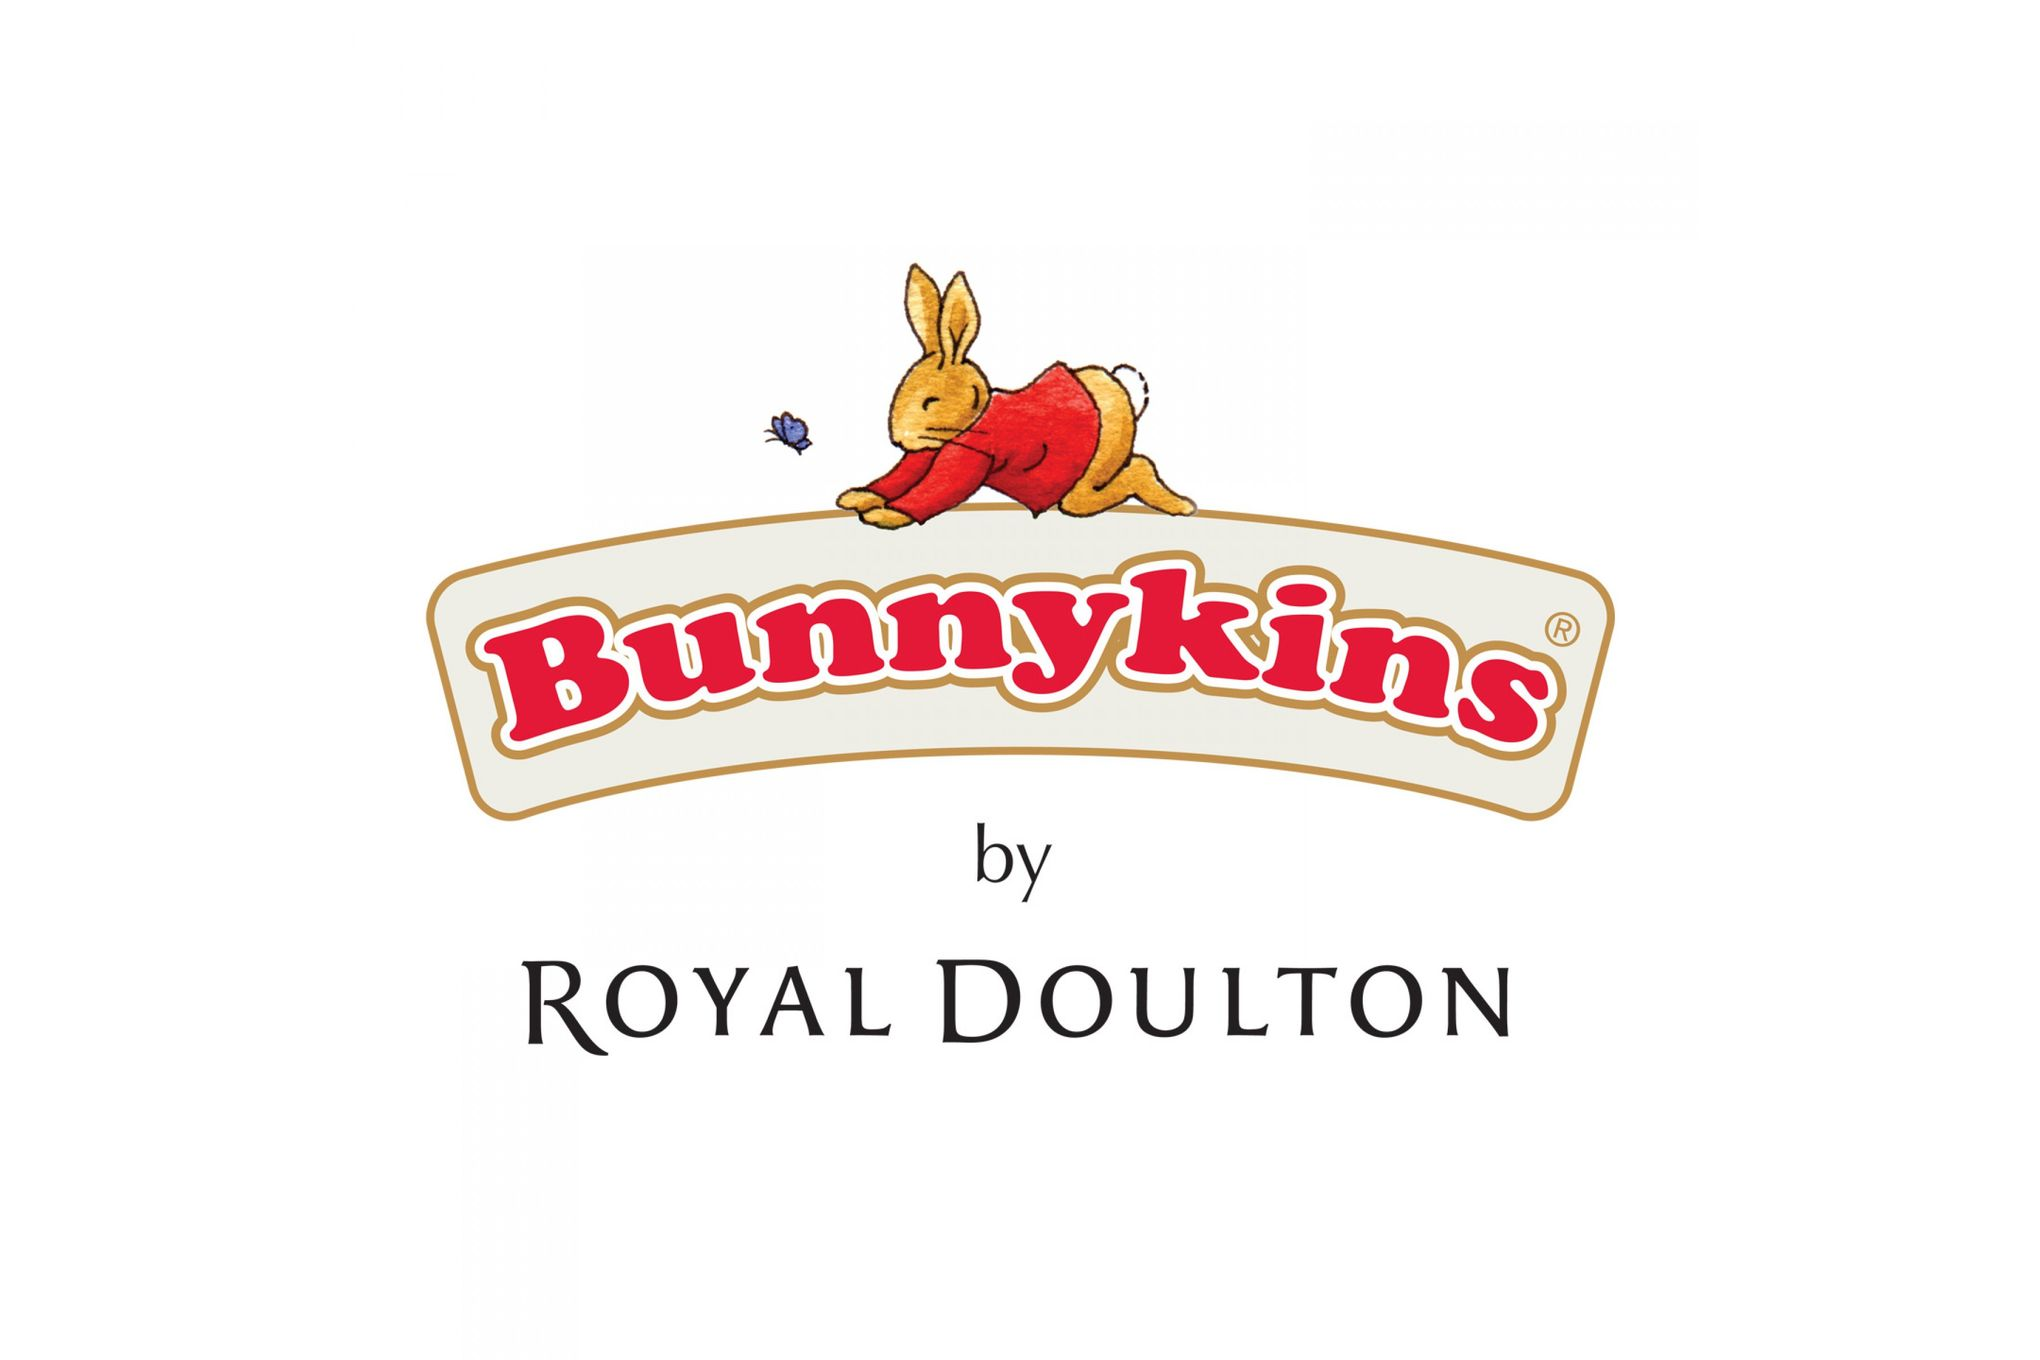 Royal Doulton Bunnykins Side Plate Designs Vary 20cm thumb 2